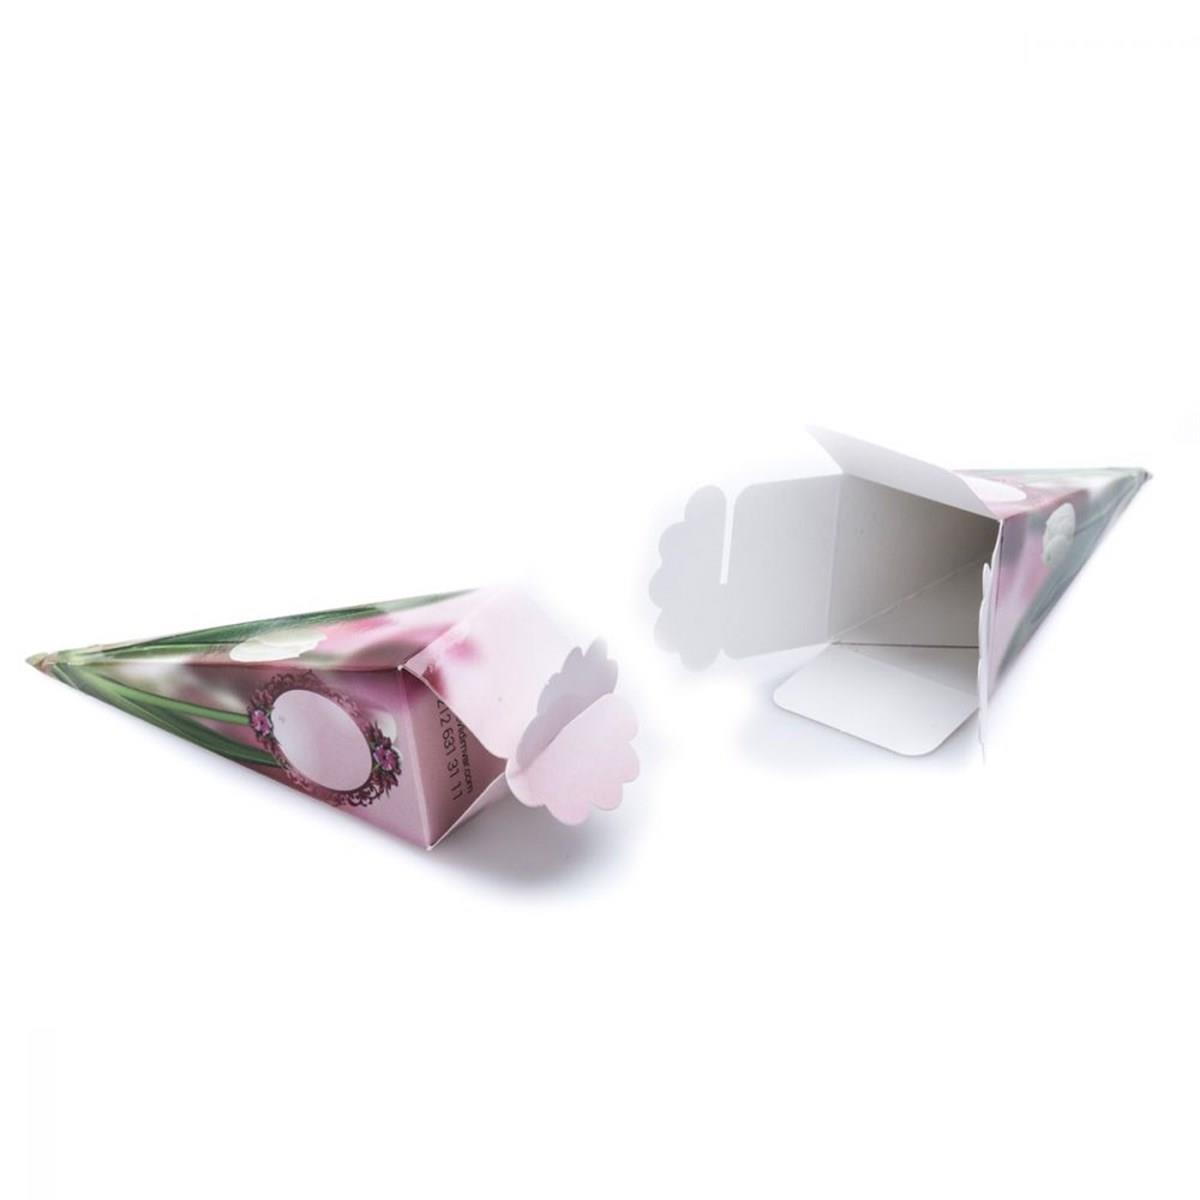 Lale Mevlüt Şekeri Kutusu-Külah